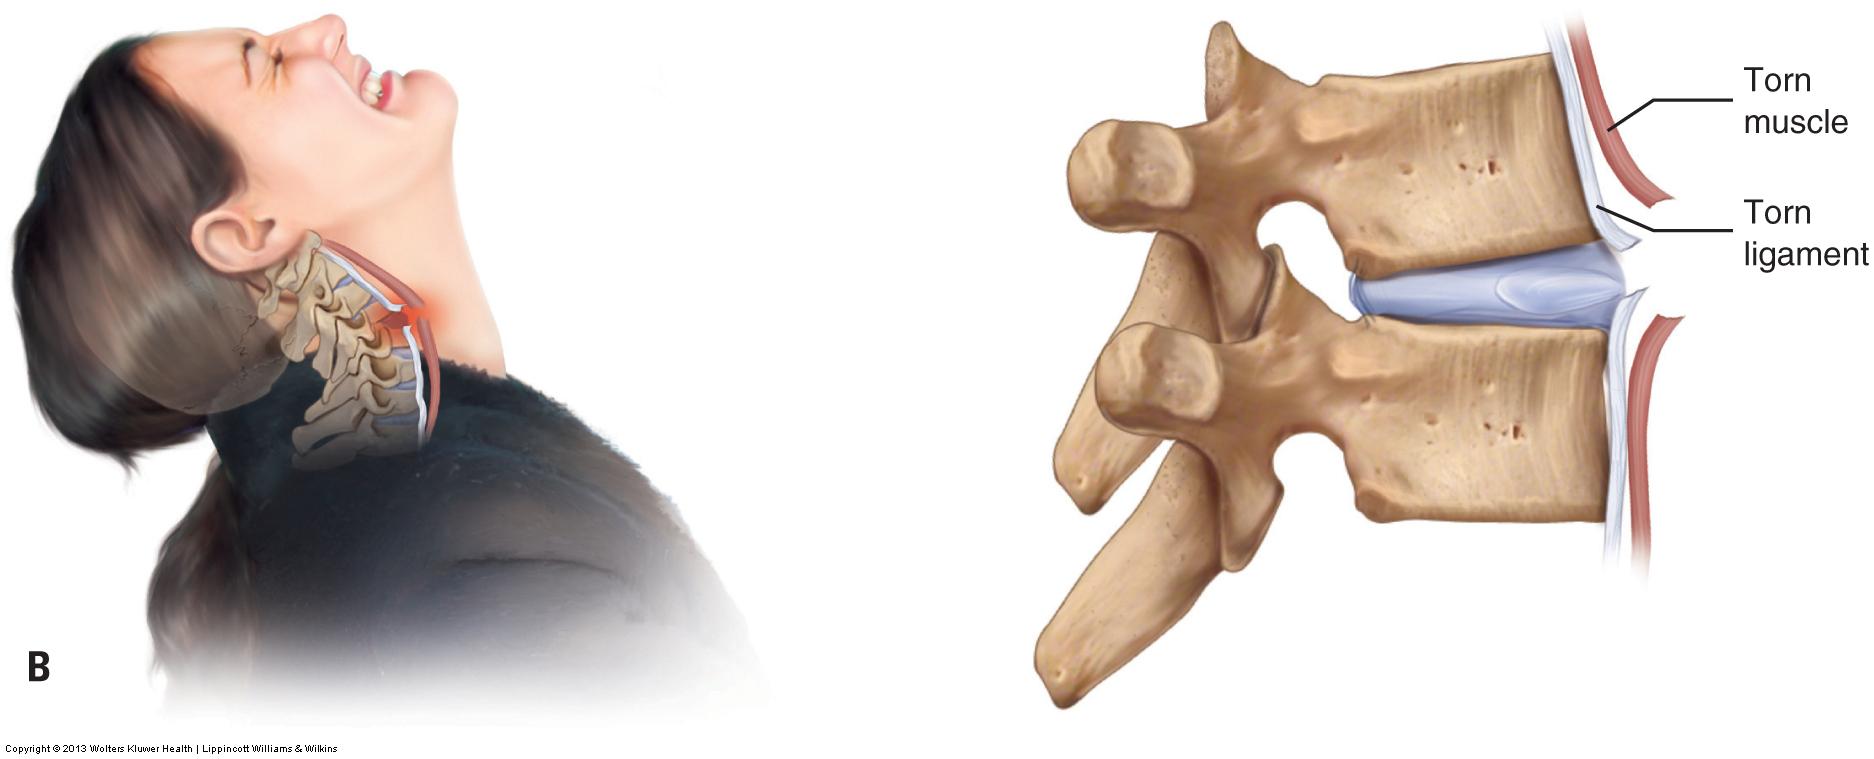 Whiplash into extension tearing anterior myofascial tissues. Permission: Joseph E. Muscolino. Advanced Treatment Techniques for the Manual Therapist: Neck (2013).